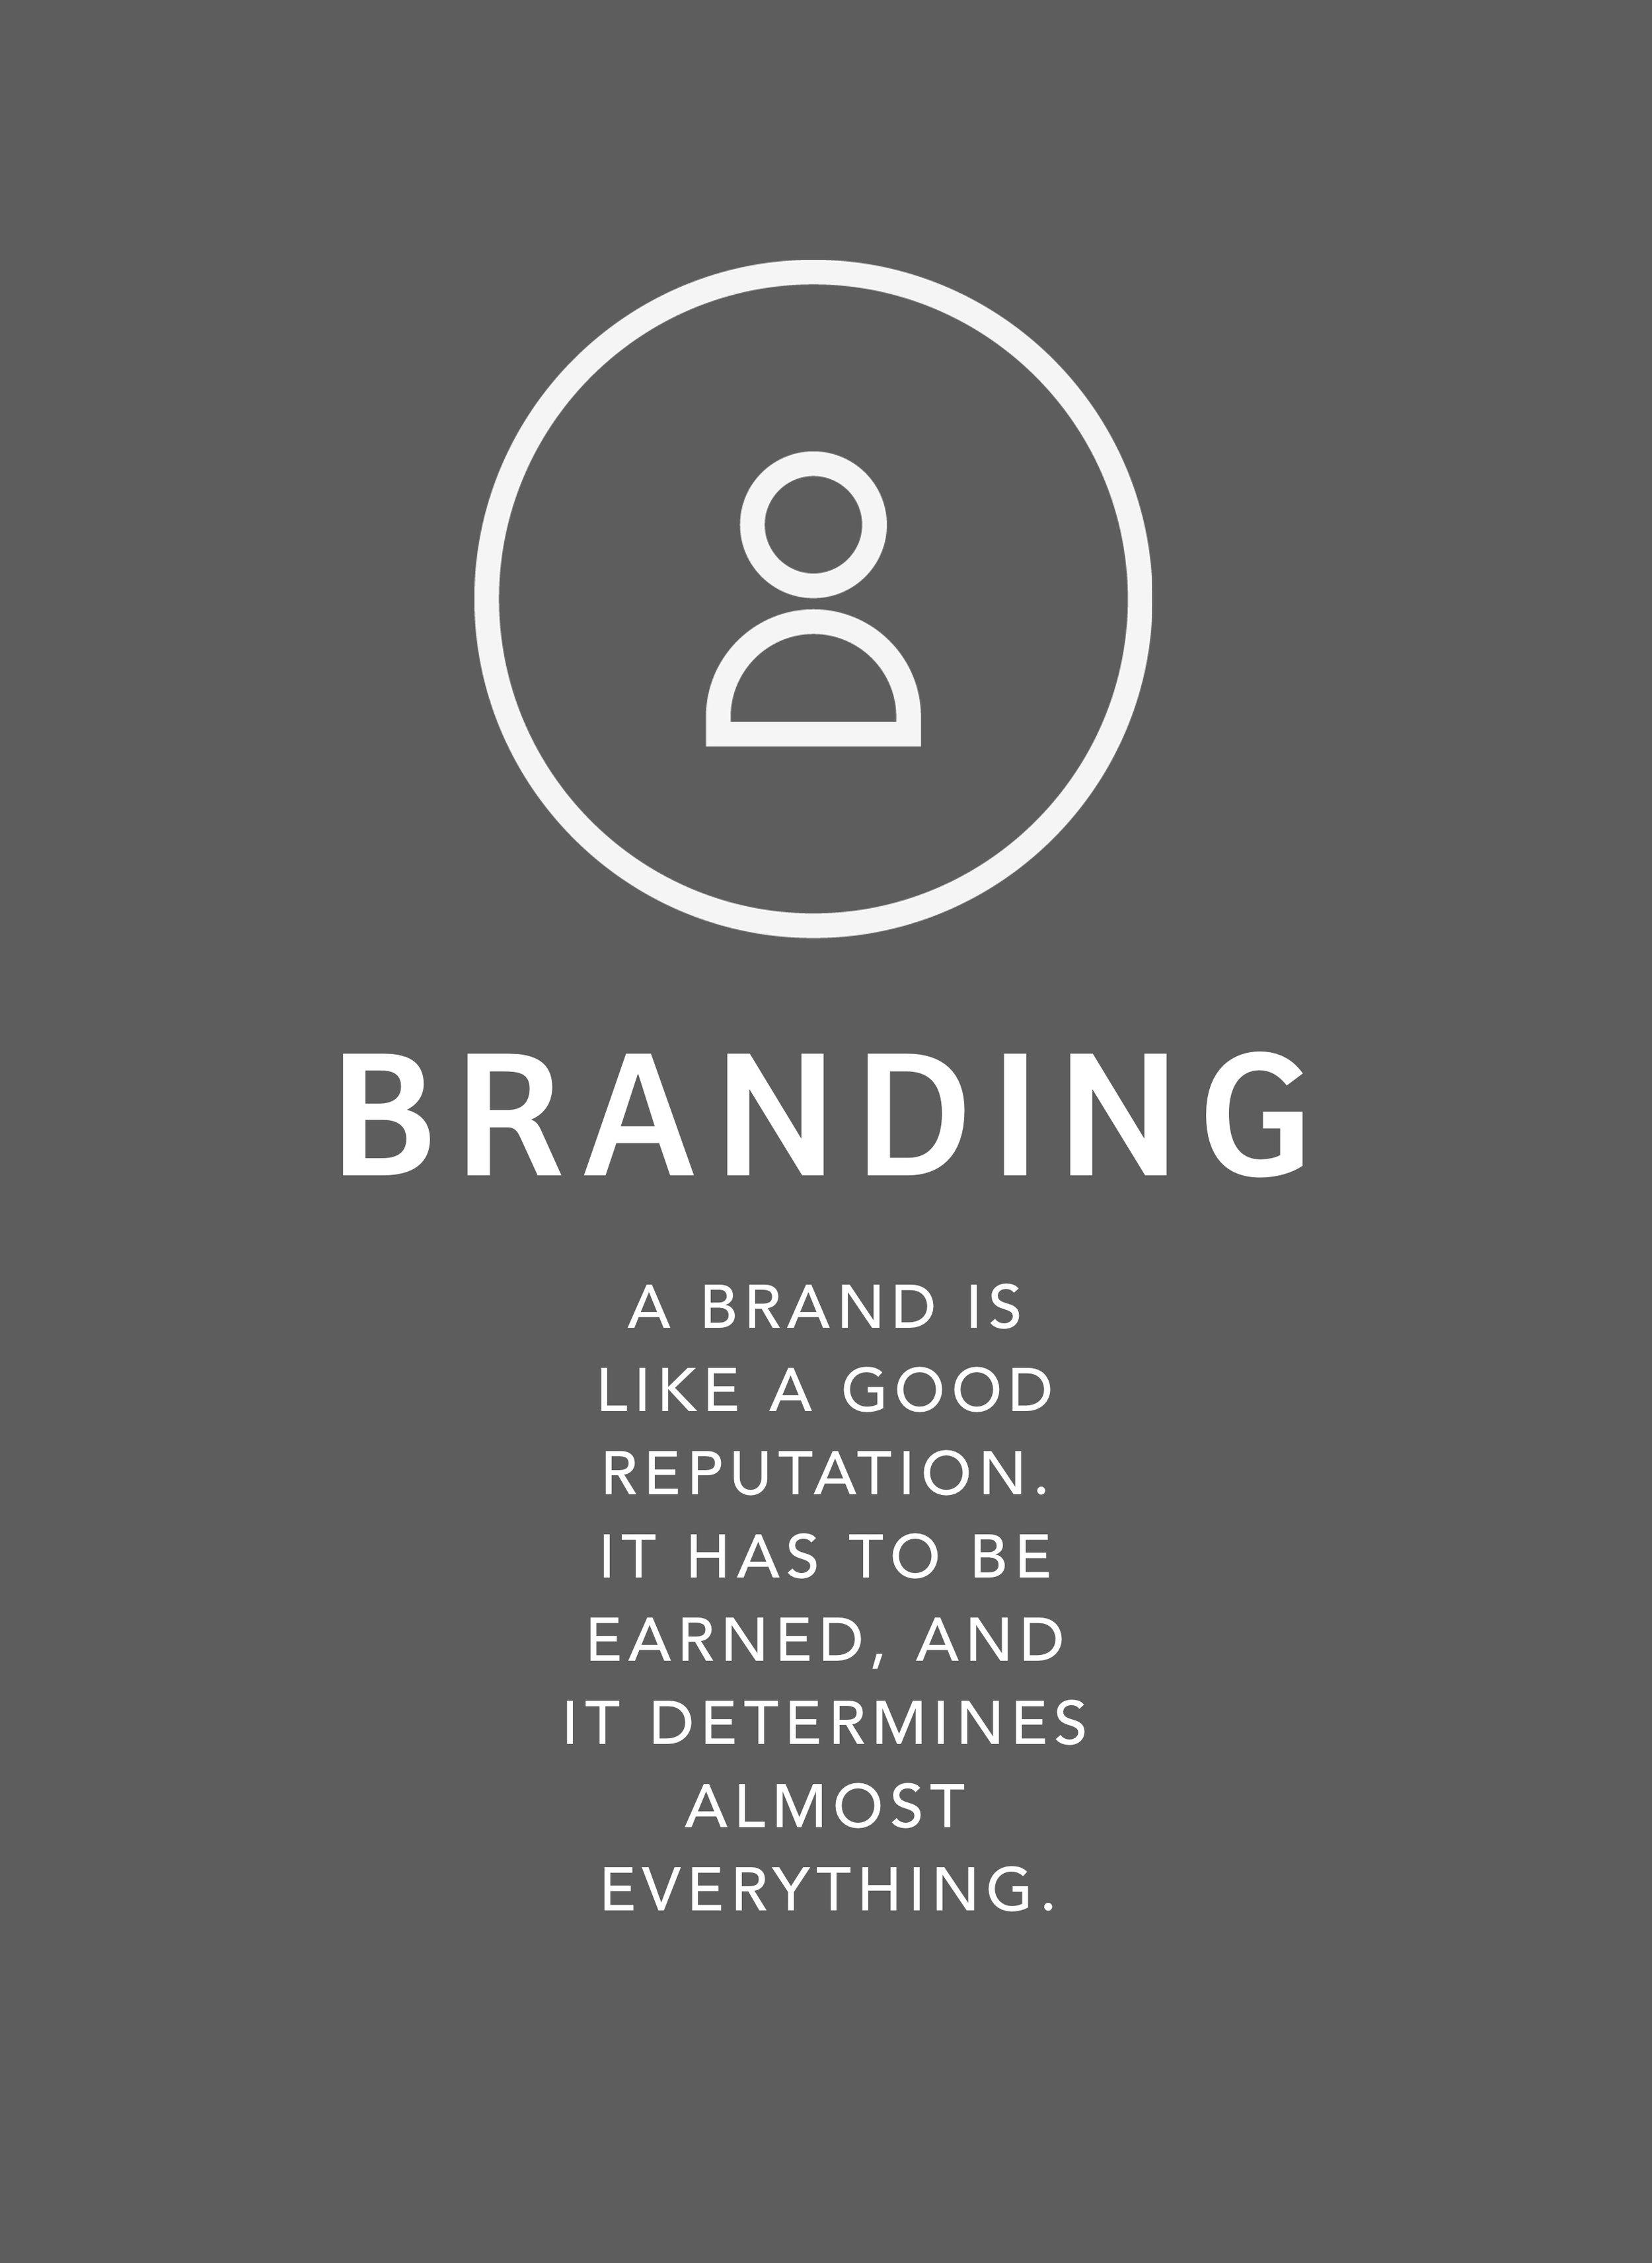 amplify creative services - branding.jpg